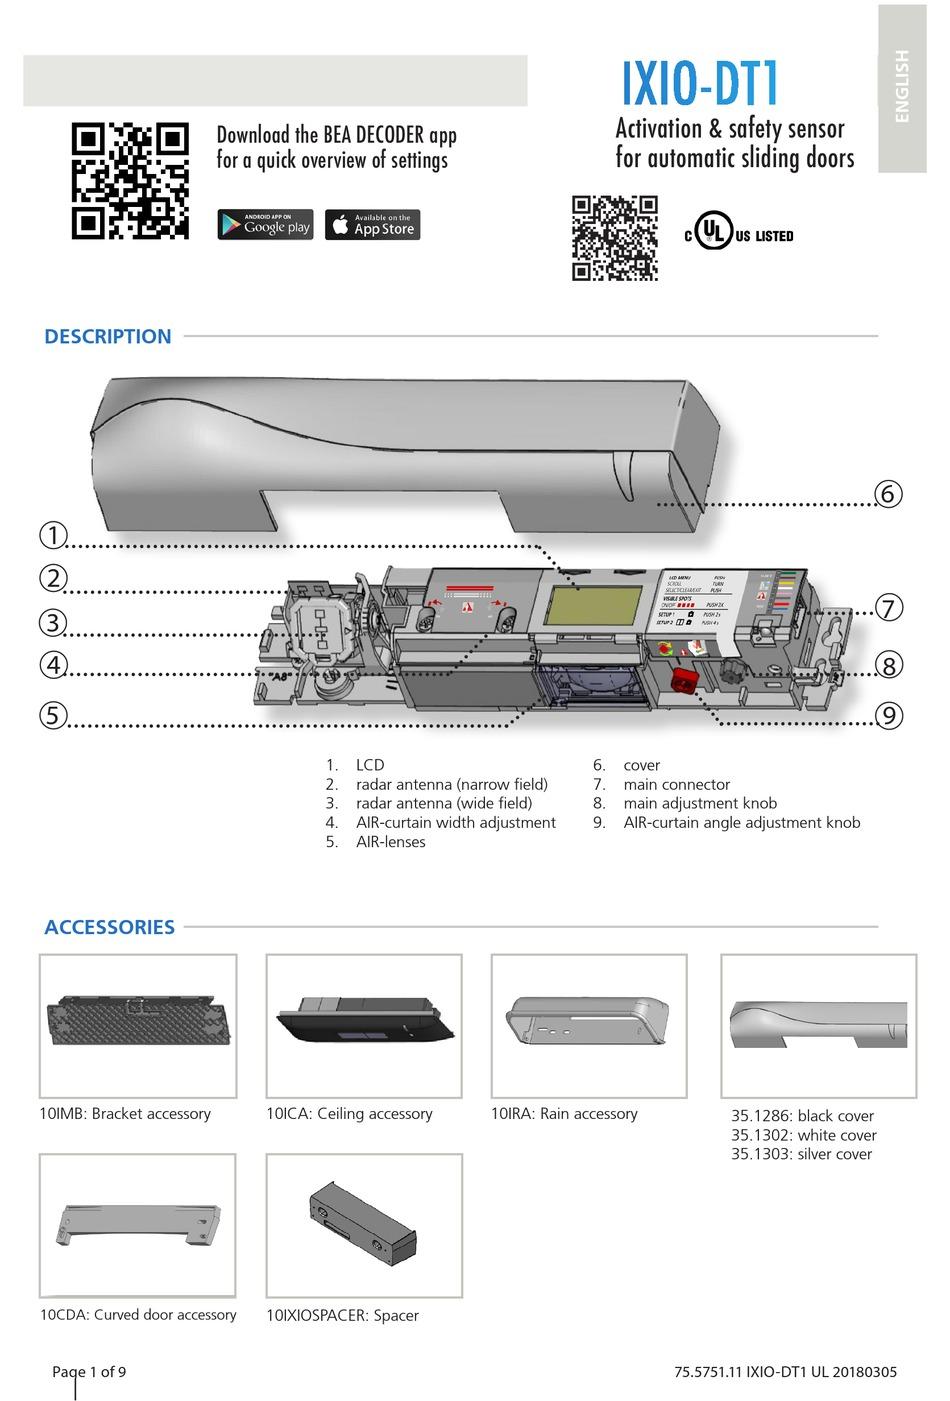 BEA IXIO-DT1 MANUAL Pdf Download | ManualsLib | Dt1 Wiring Diagram |  | ManualsLib